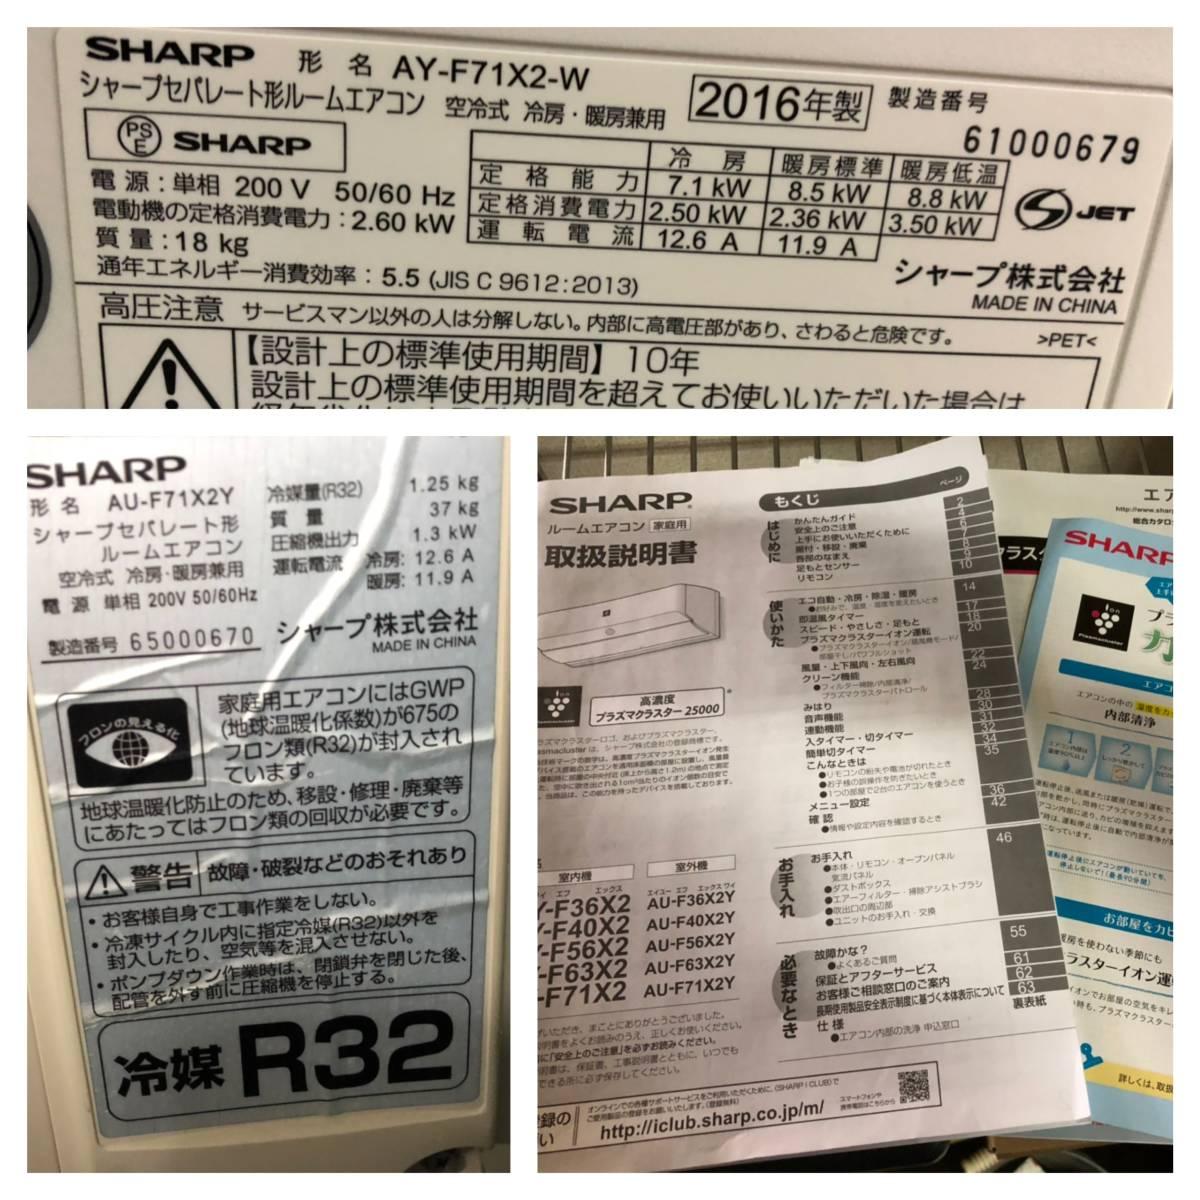 S☆665 シャープ ルームエアコン AY-F71X2-W プラズマクラスター 単相200V_画像9